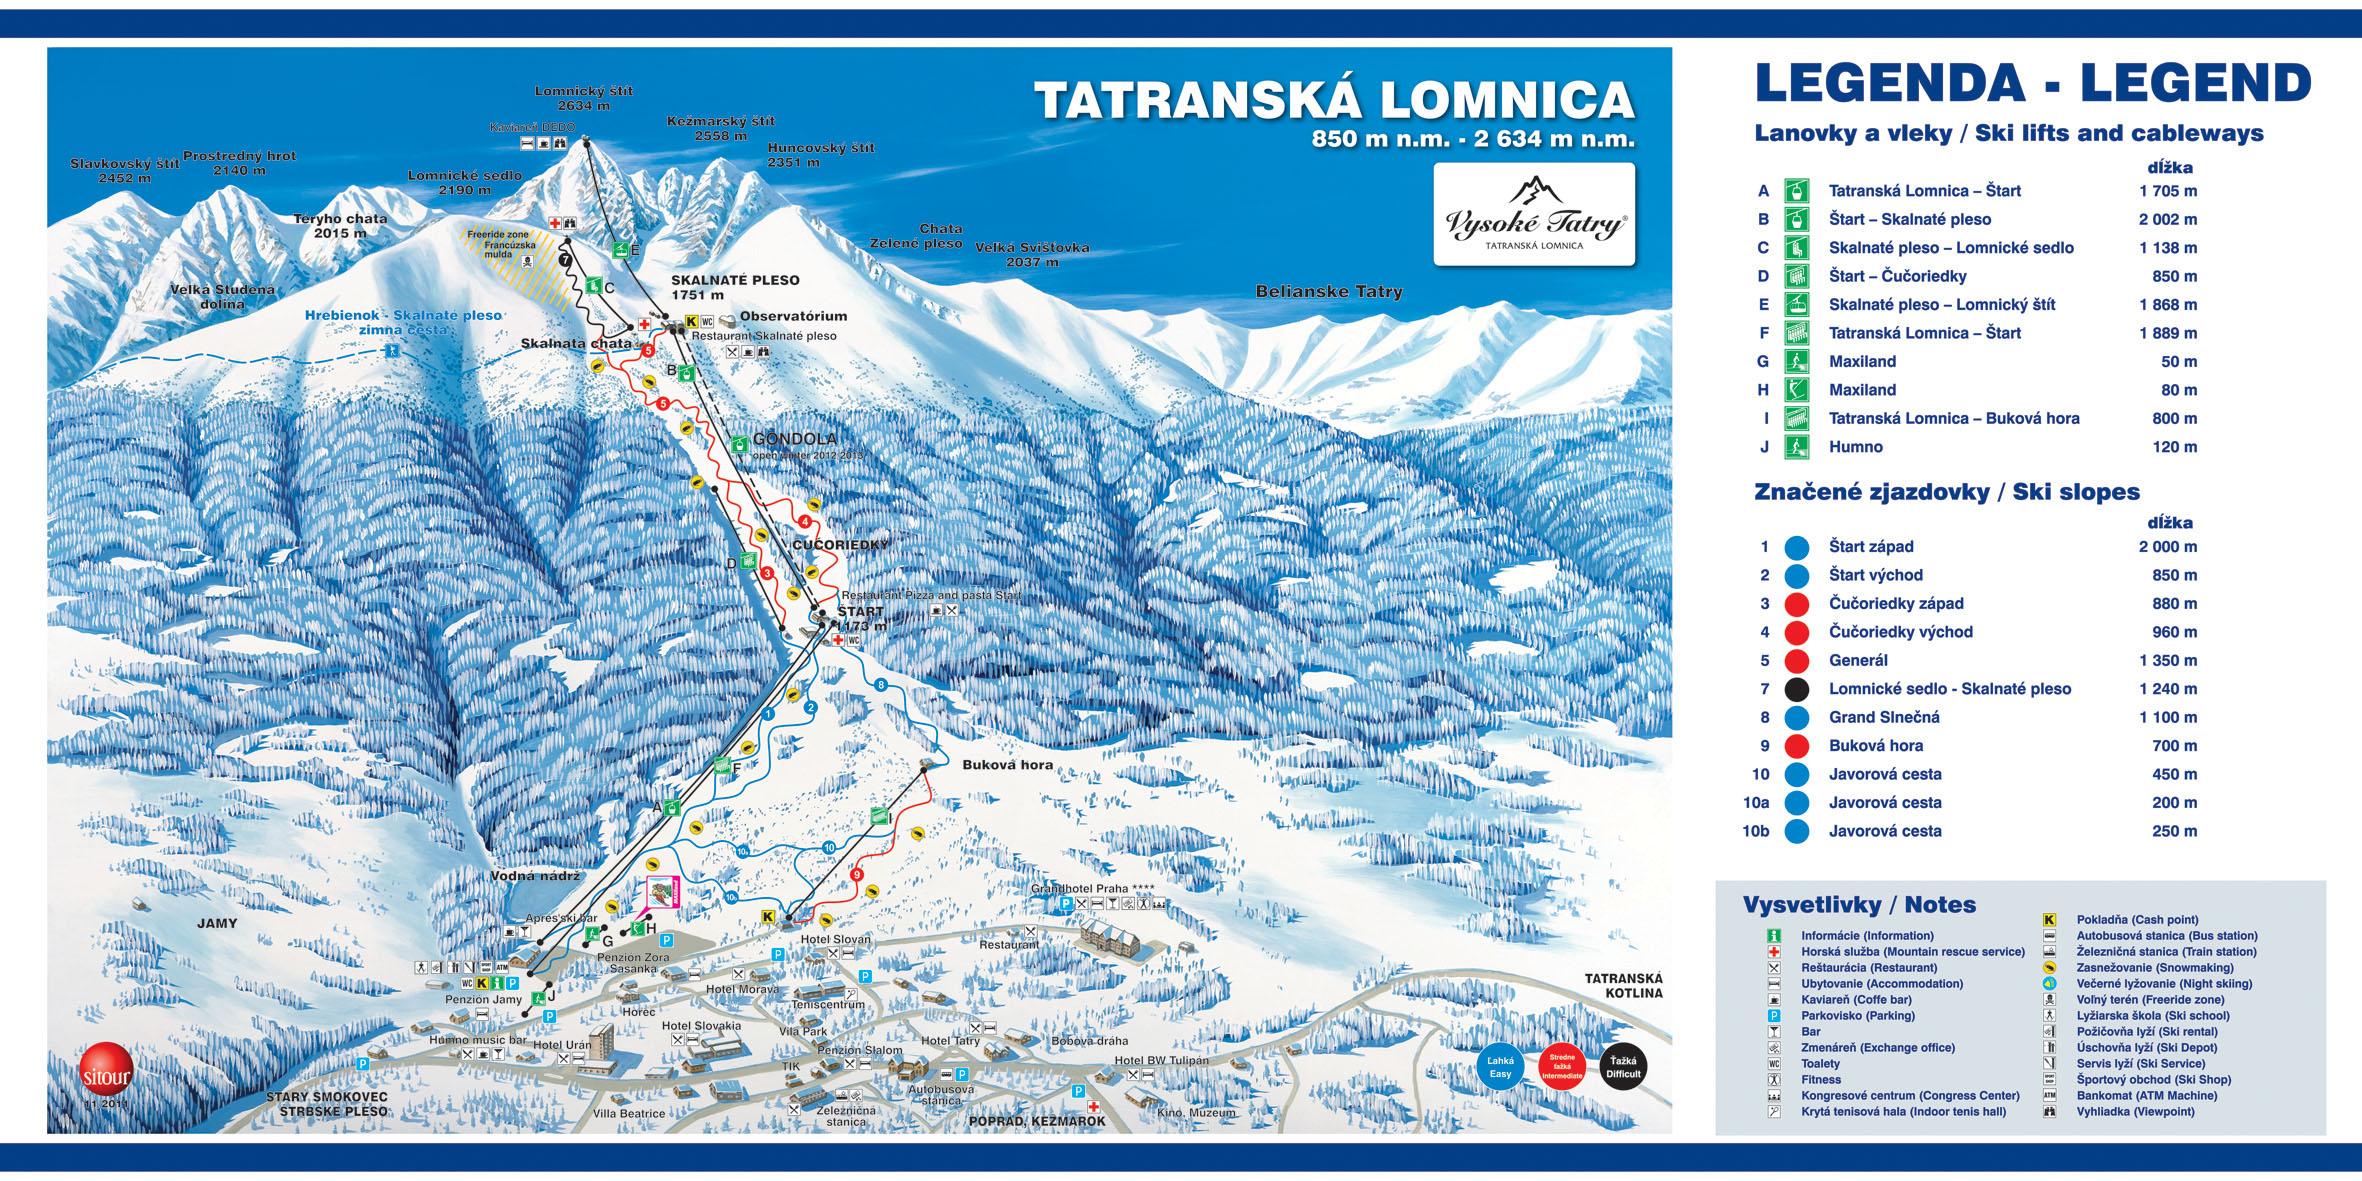 Mapa svahov v stredisku Tatranská Lomnica